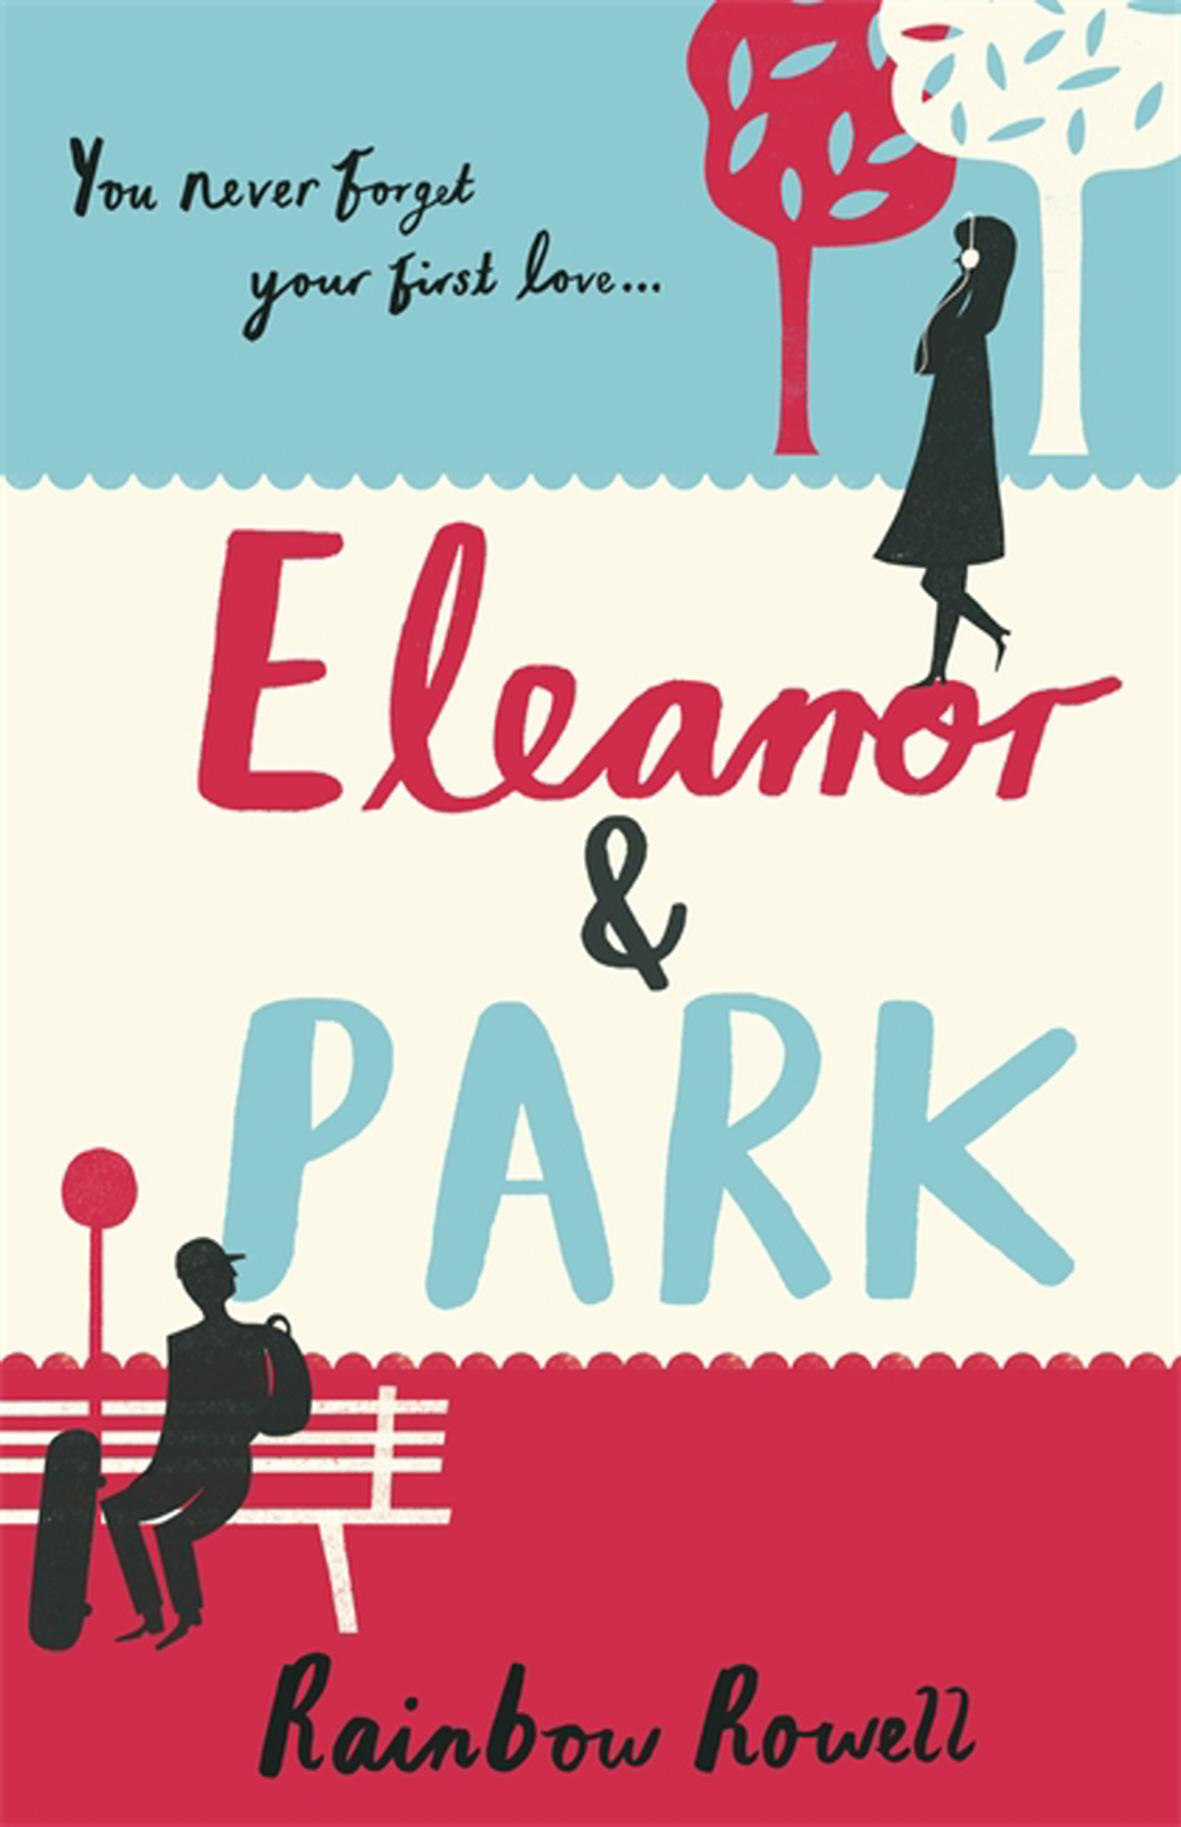 https://i2.wp.com/www.ourvalleyvoice.com/wp-content/uploads/2014/01/Eleanor-Park-Book.jpg